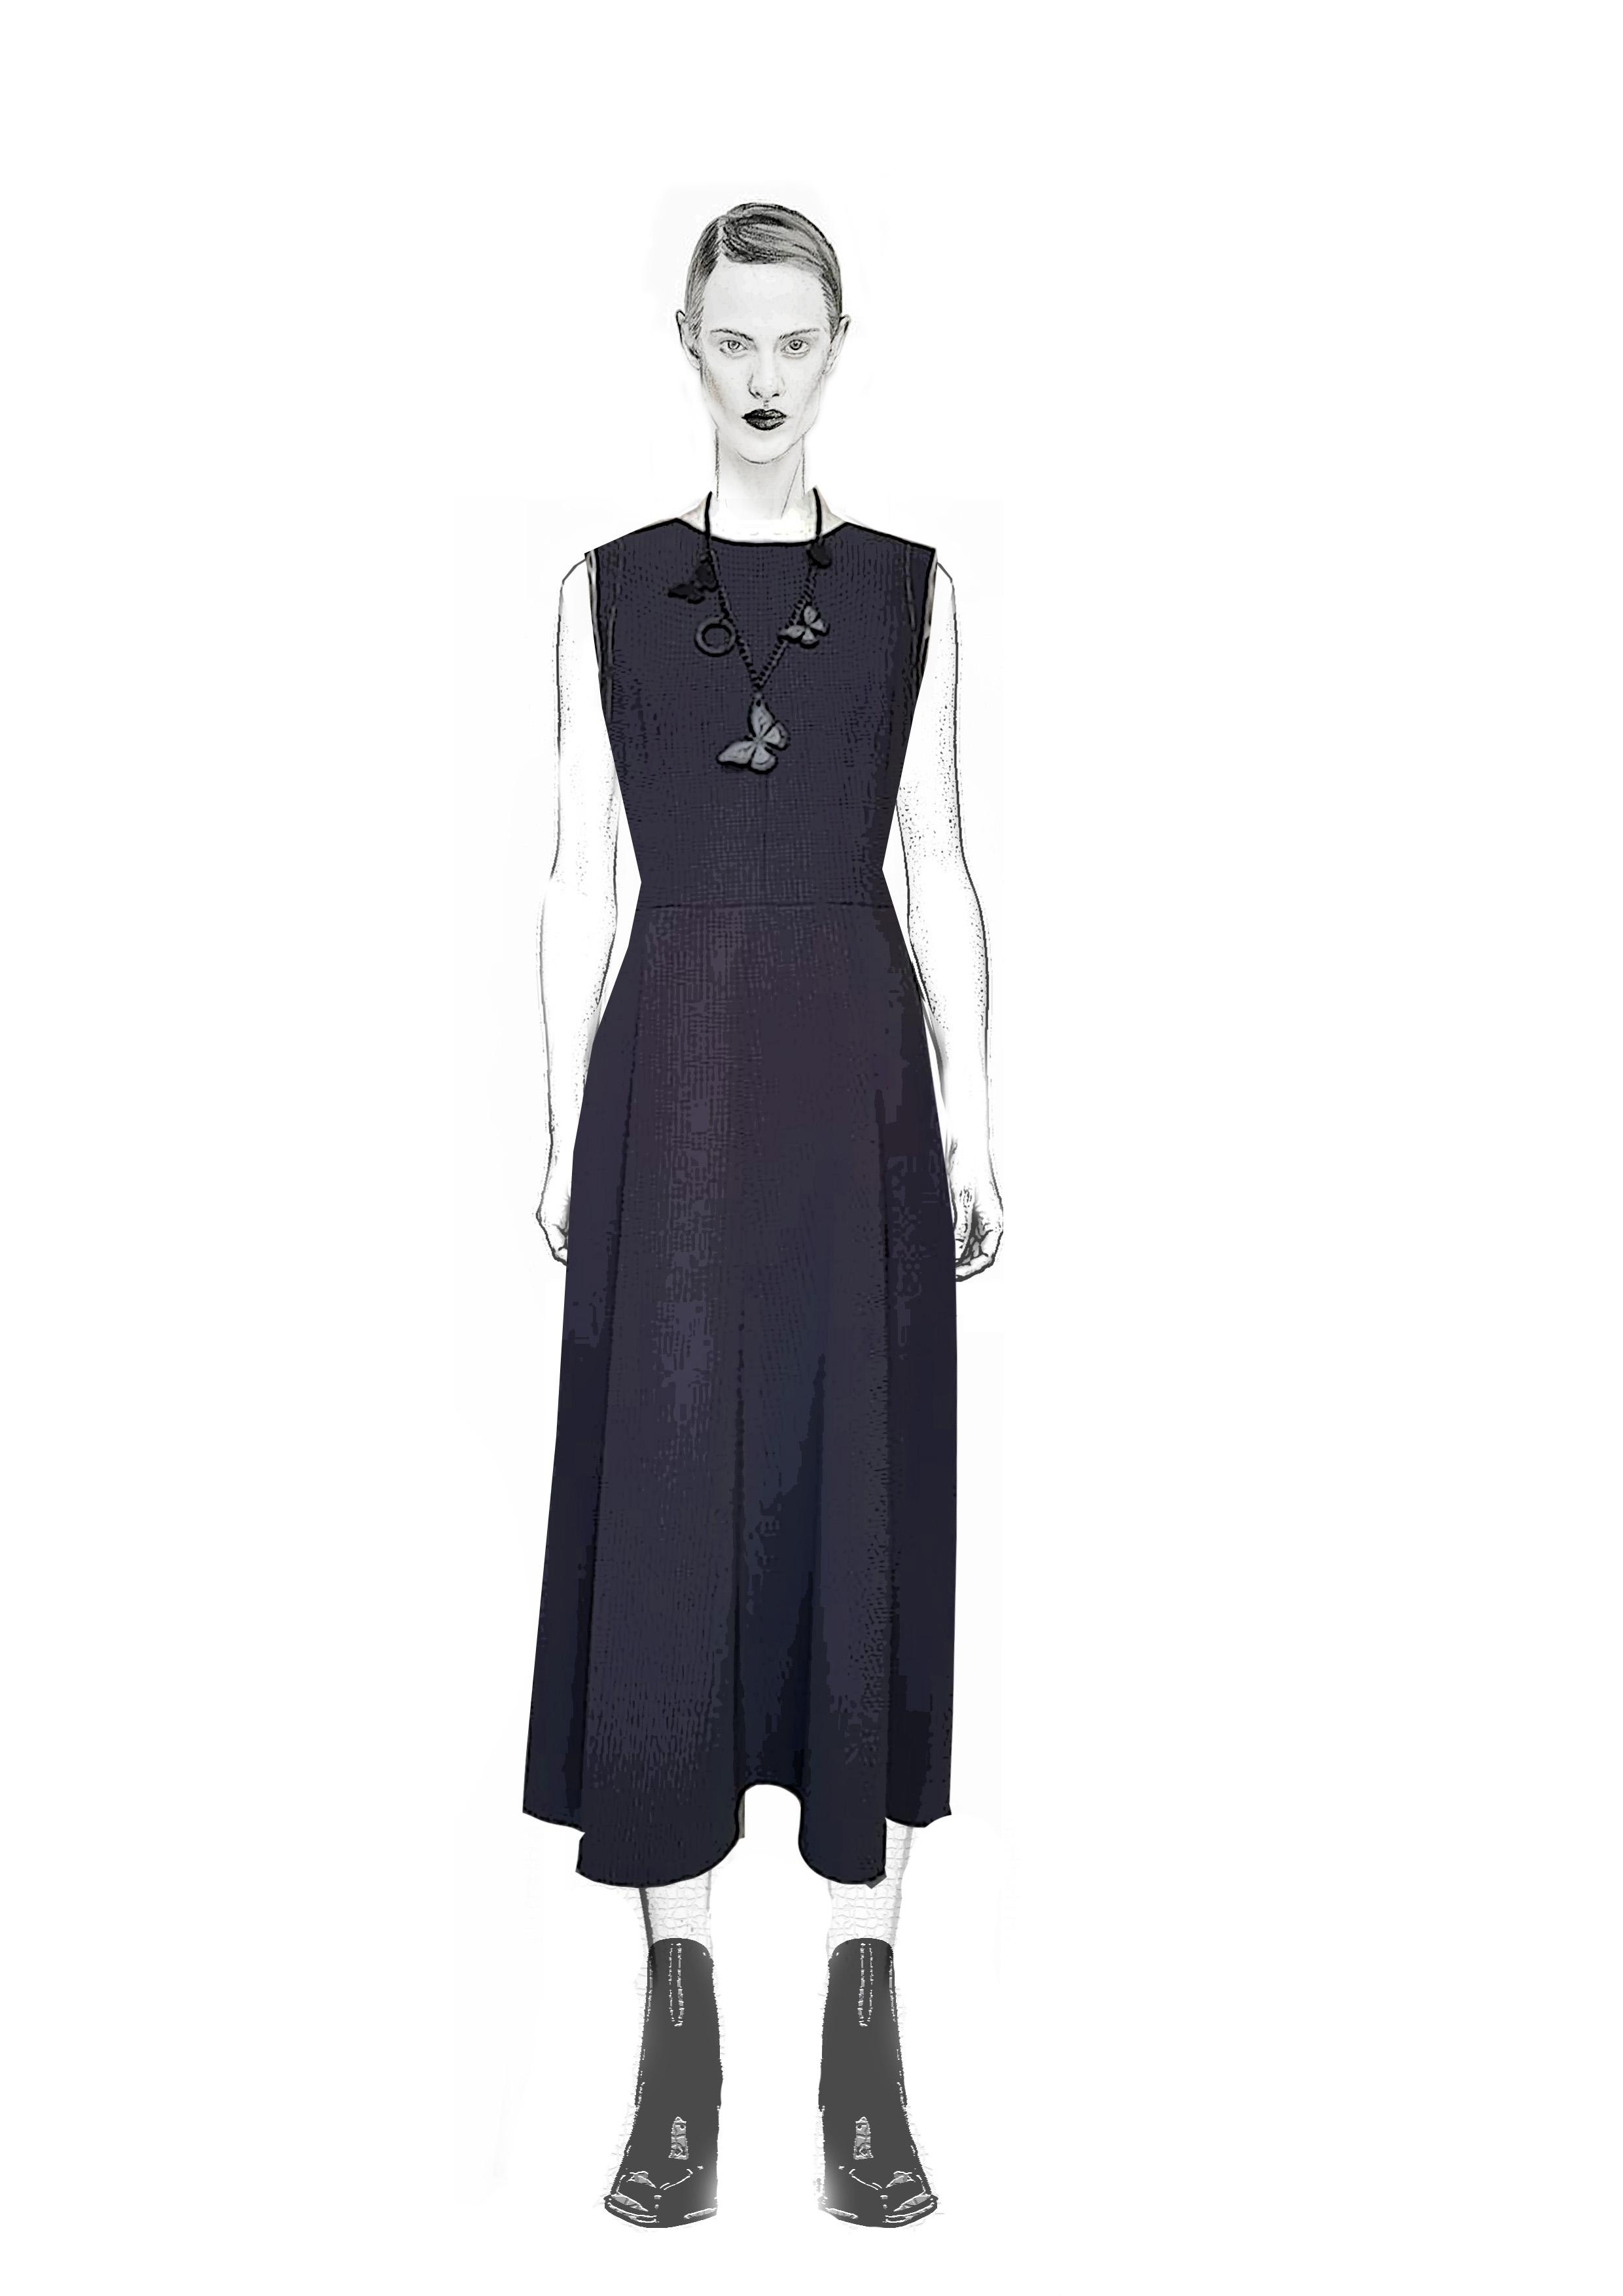 dress similar to soulas.jpg